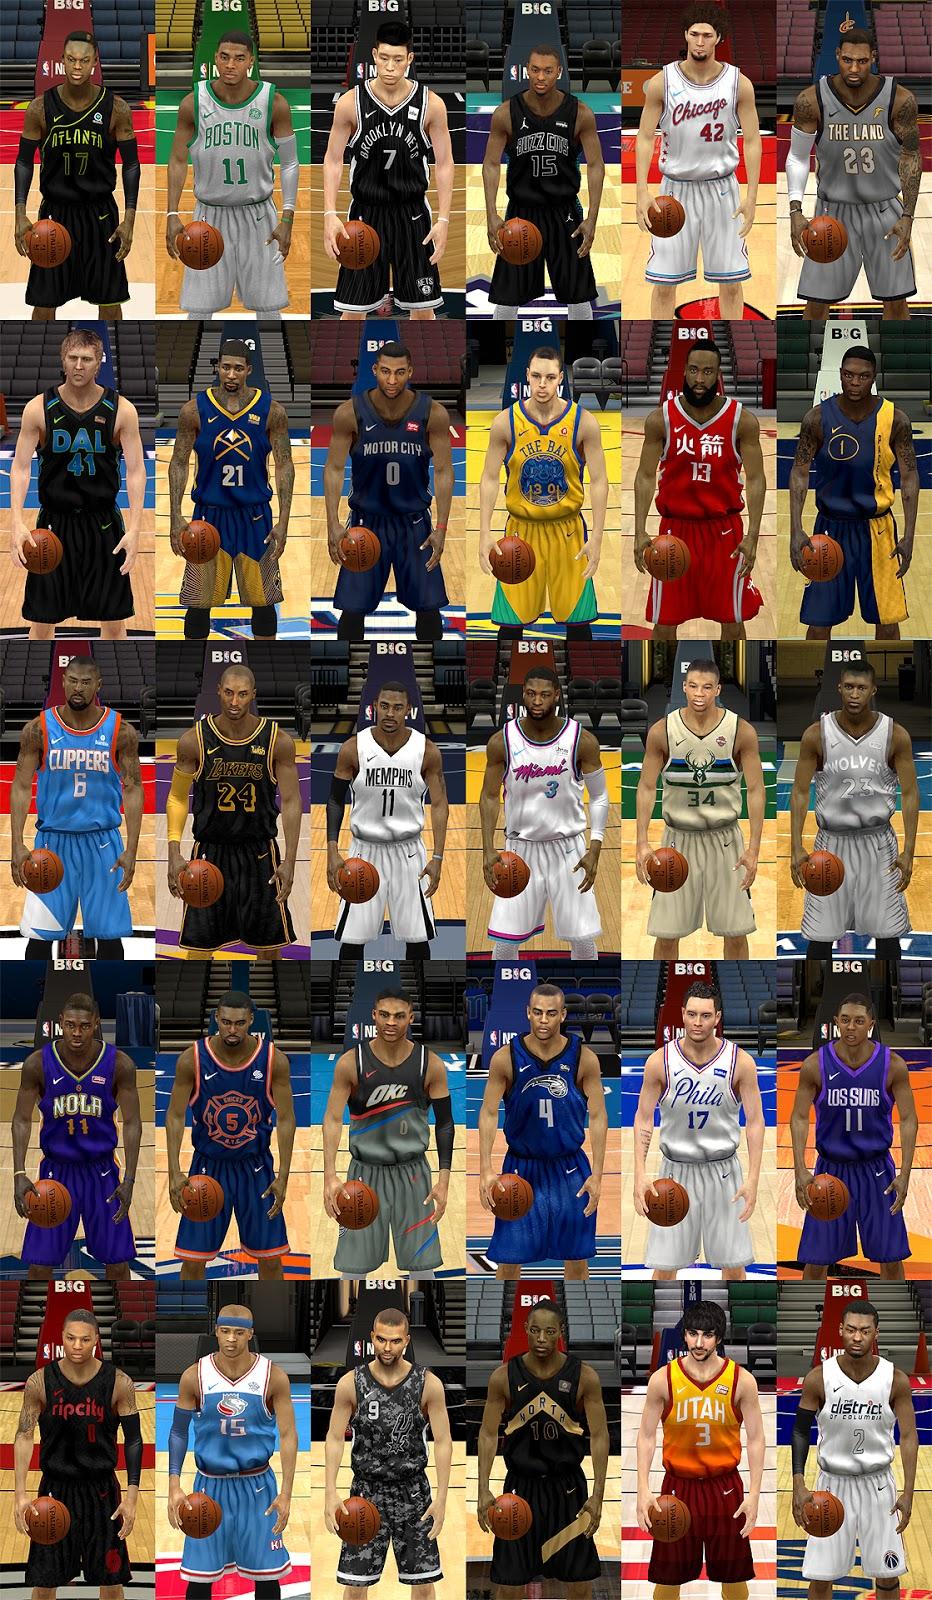 timeless design 00099 34c04 Shuajota | Your Videogame to the Next Level: NBA 2K14 - NBA ...